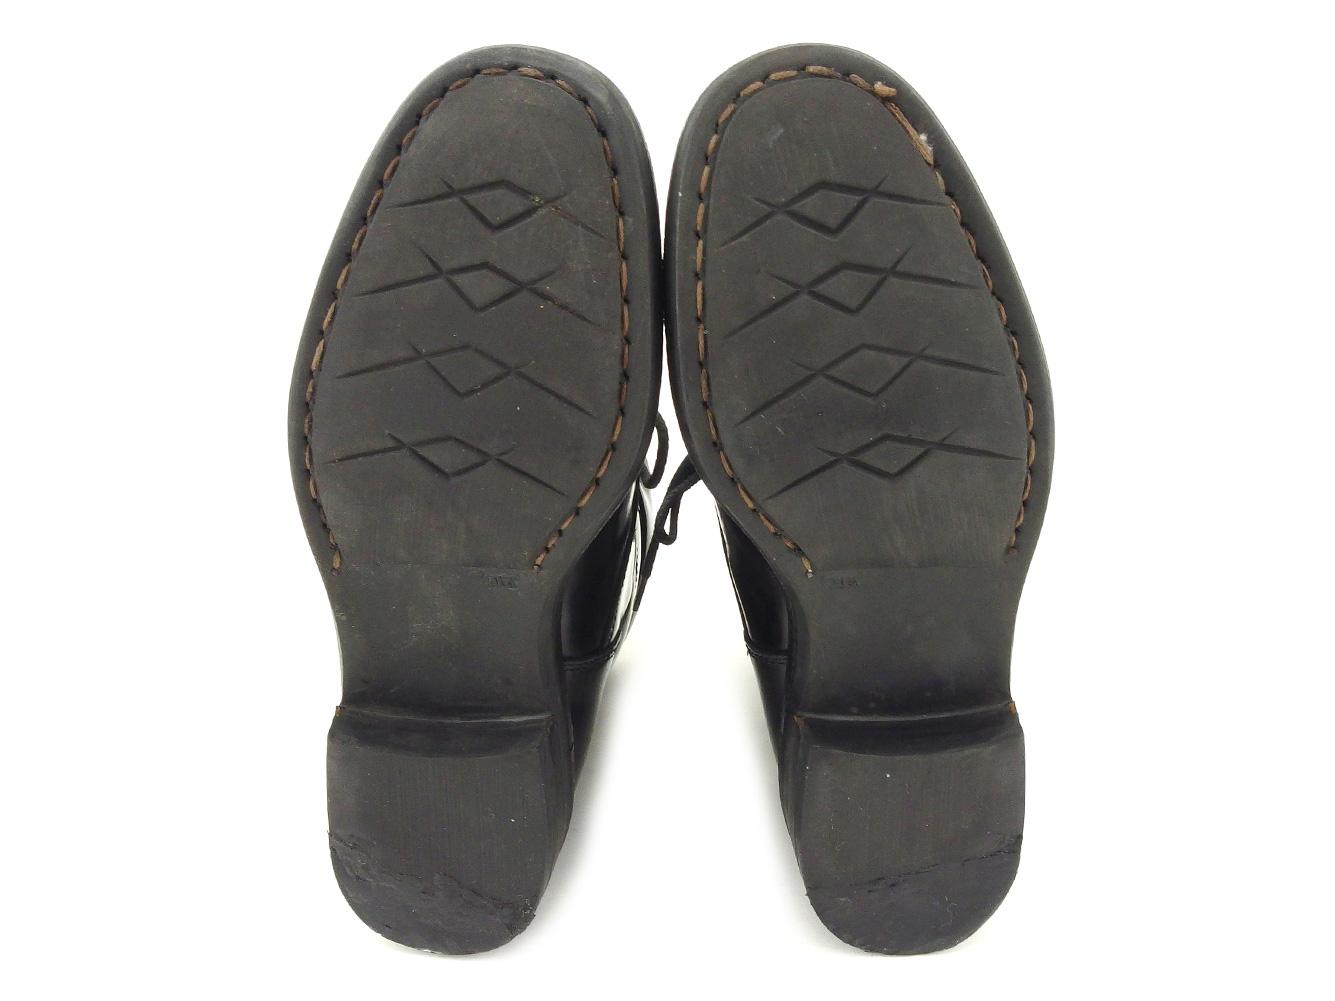 GINGER掲載商品】 【中古】グッチ GUCCI ブーツ シューズ 靴